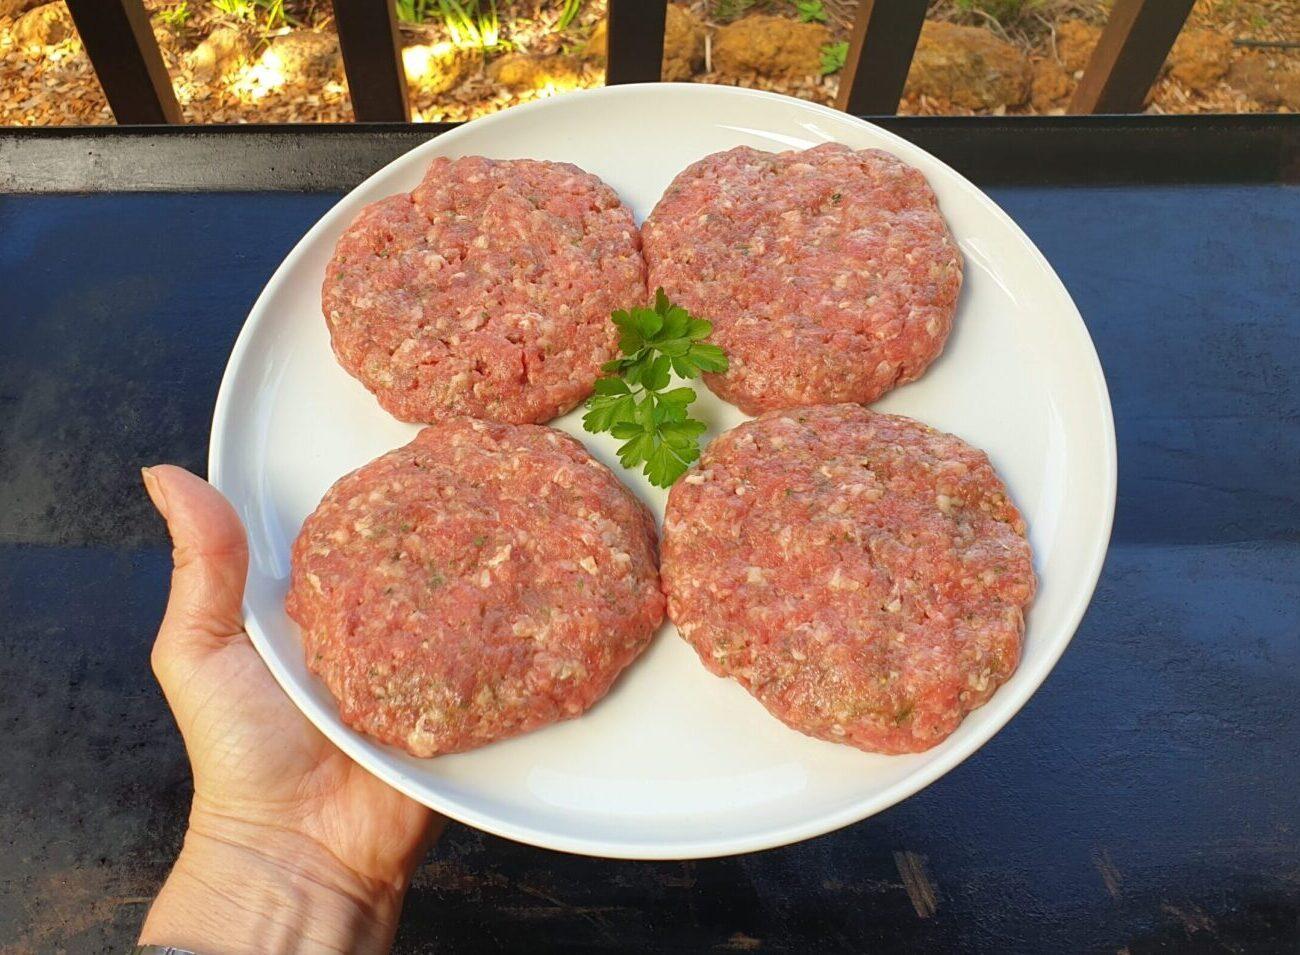 The Best Beef Burger Recipe